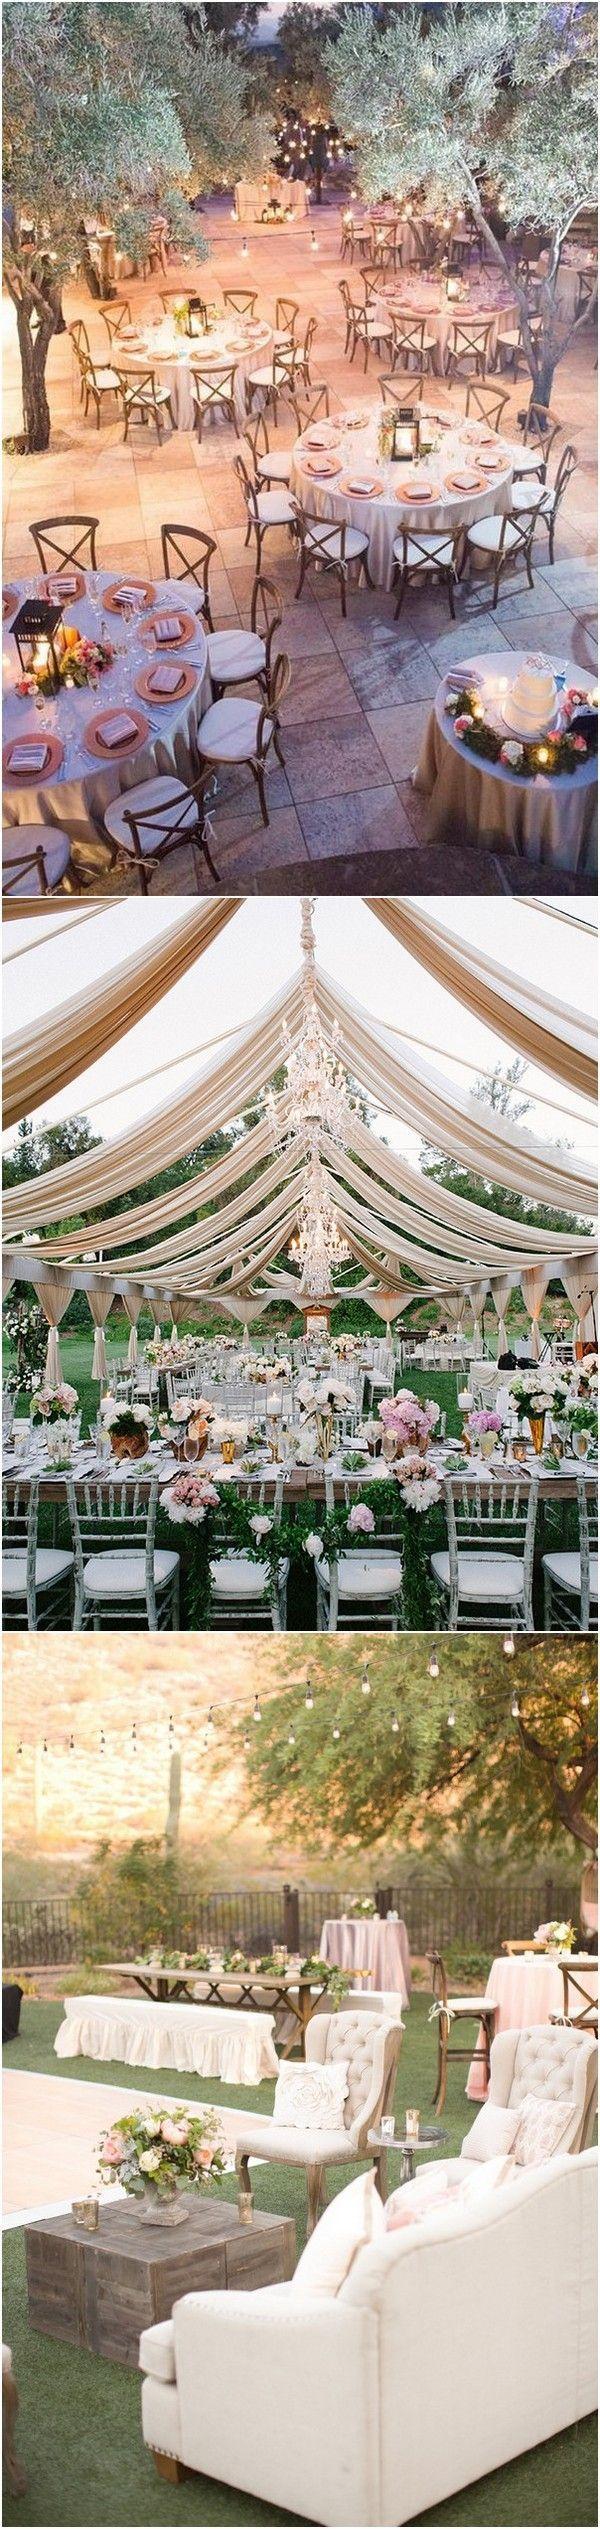 new england wedding venues on budget%0A Outdoor Wedding Reception Decoration Ideas